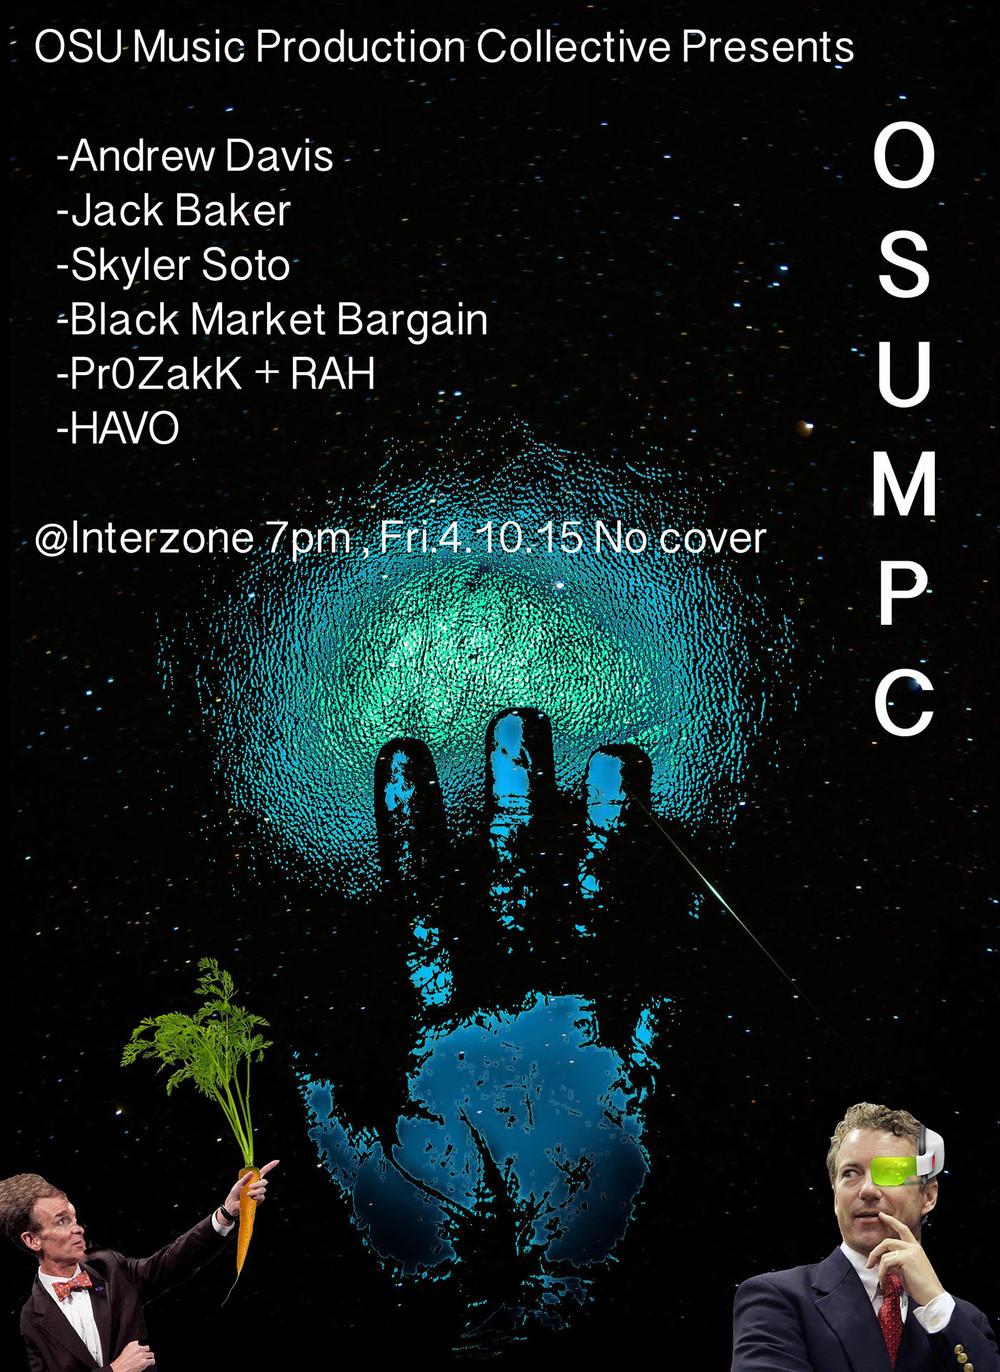 Interzone+OSUMPC+Jack+Baker.jpg